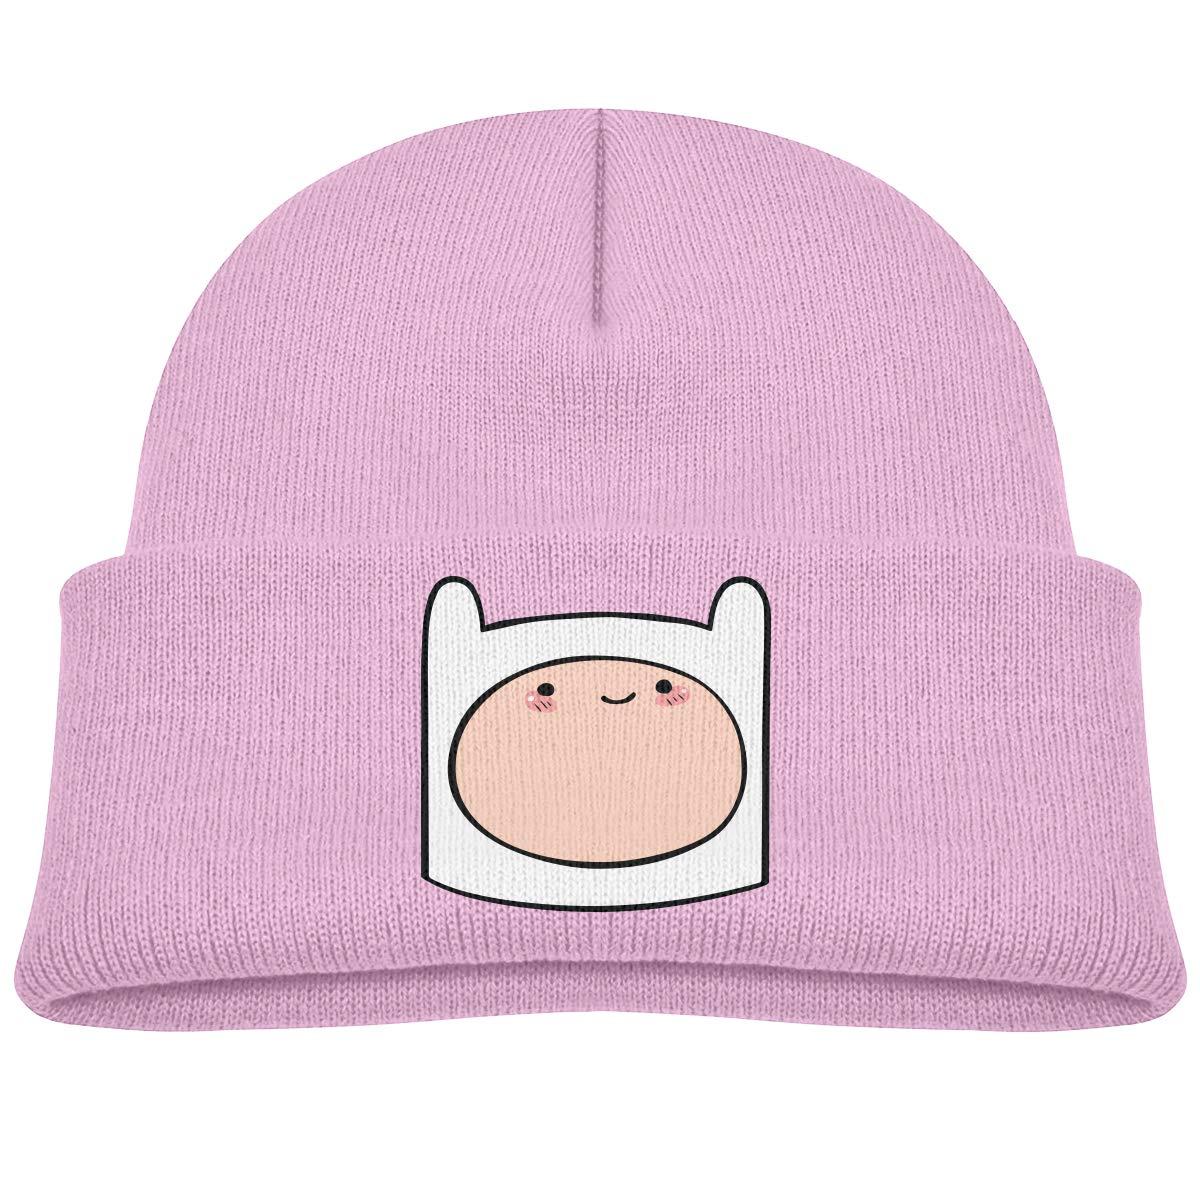 SDWYD Adventure Time Finn Baby Boy Girl Toddler Kids Knitted Hat Cap